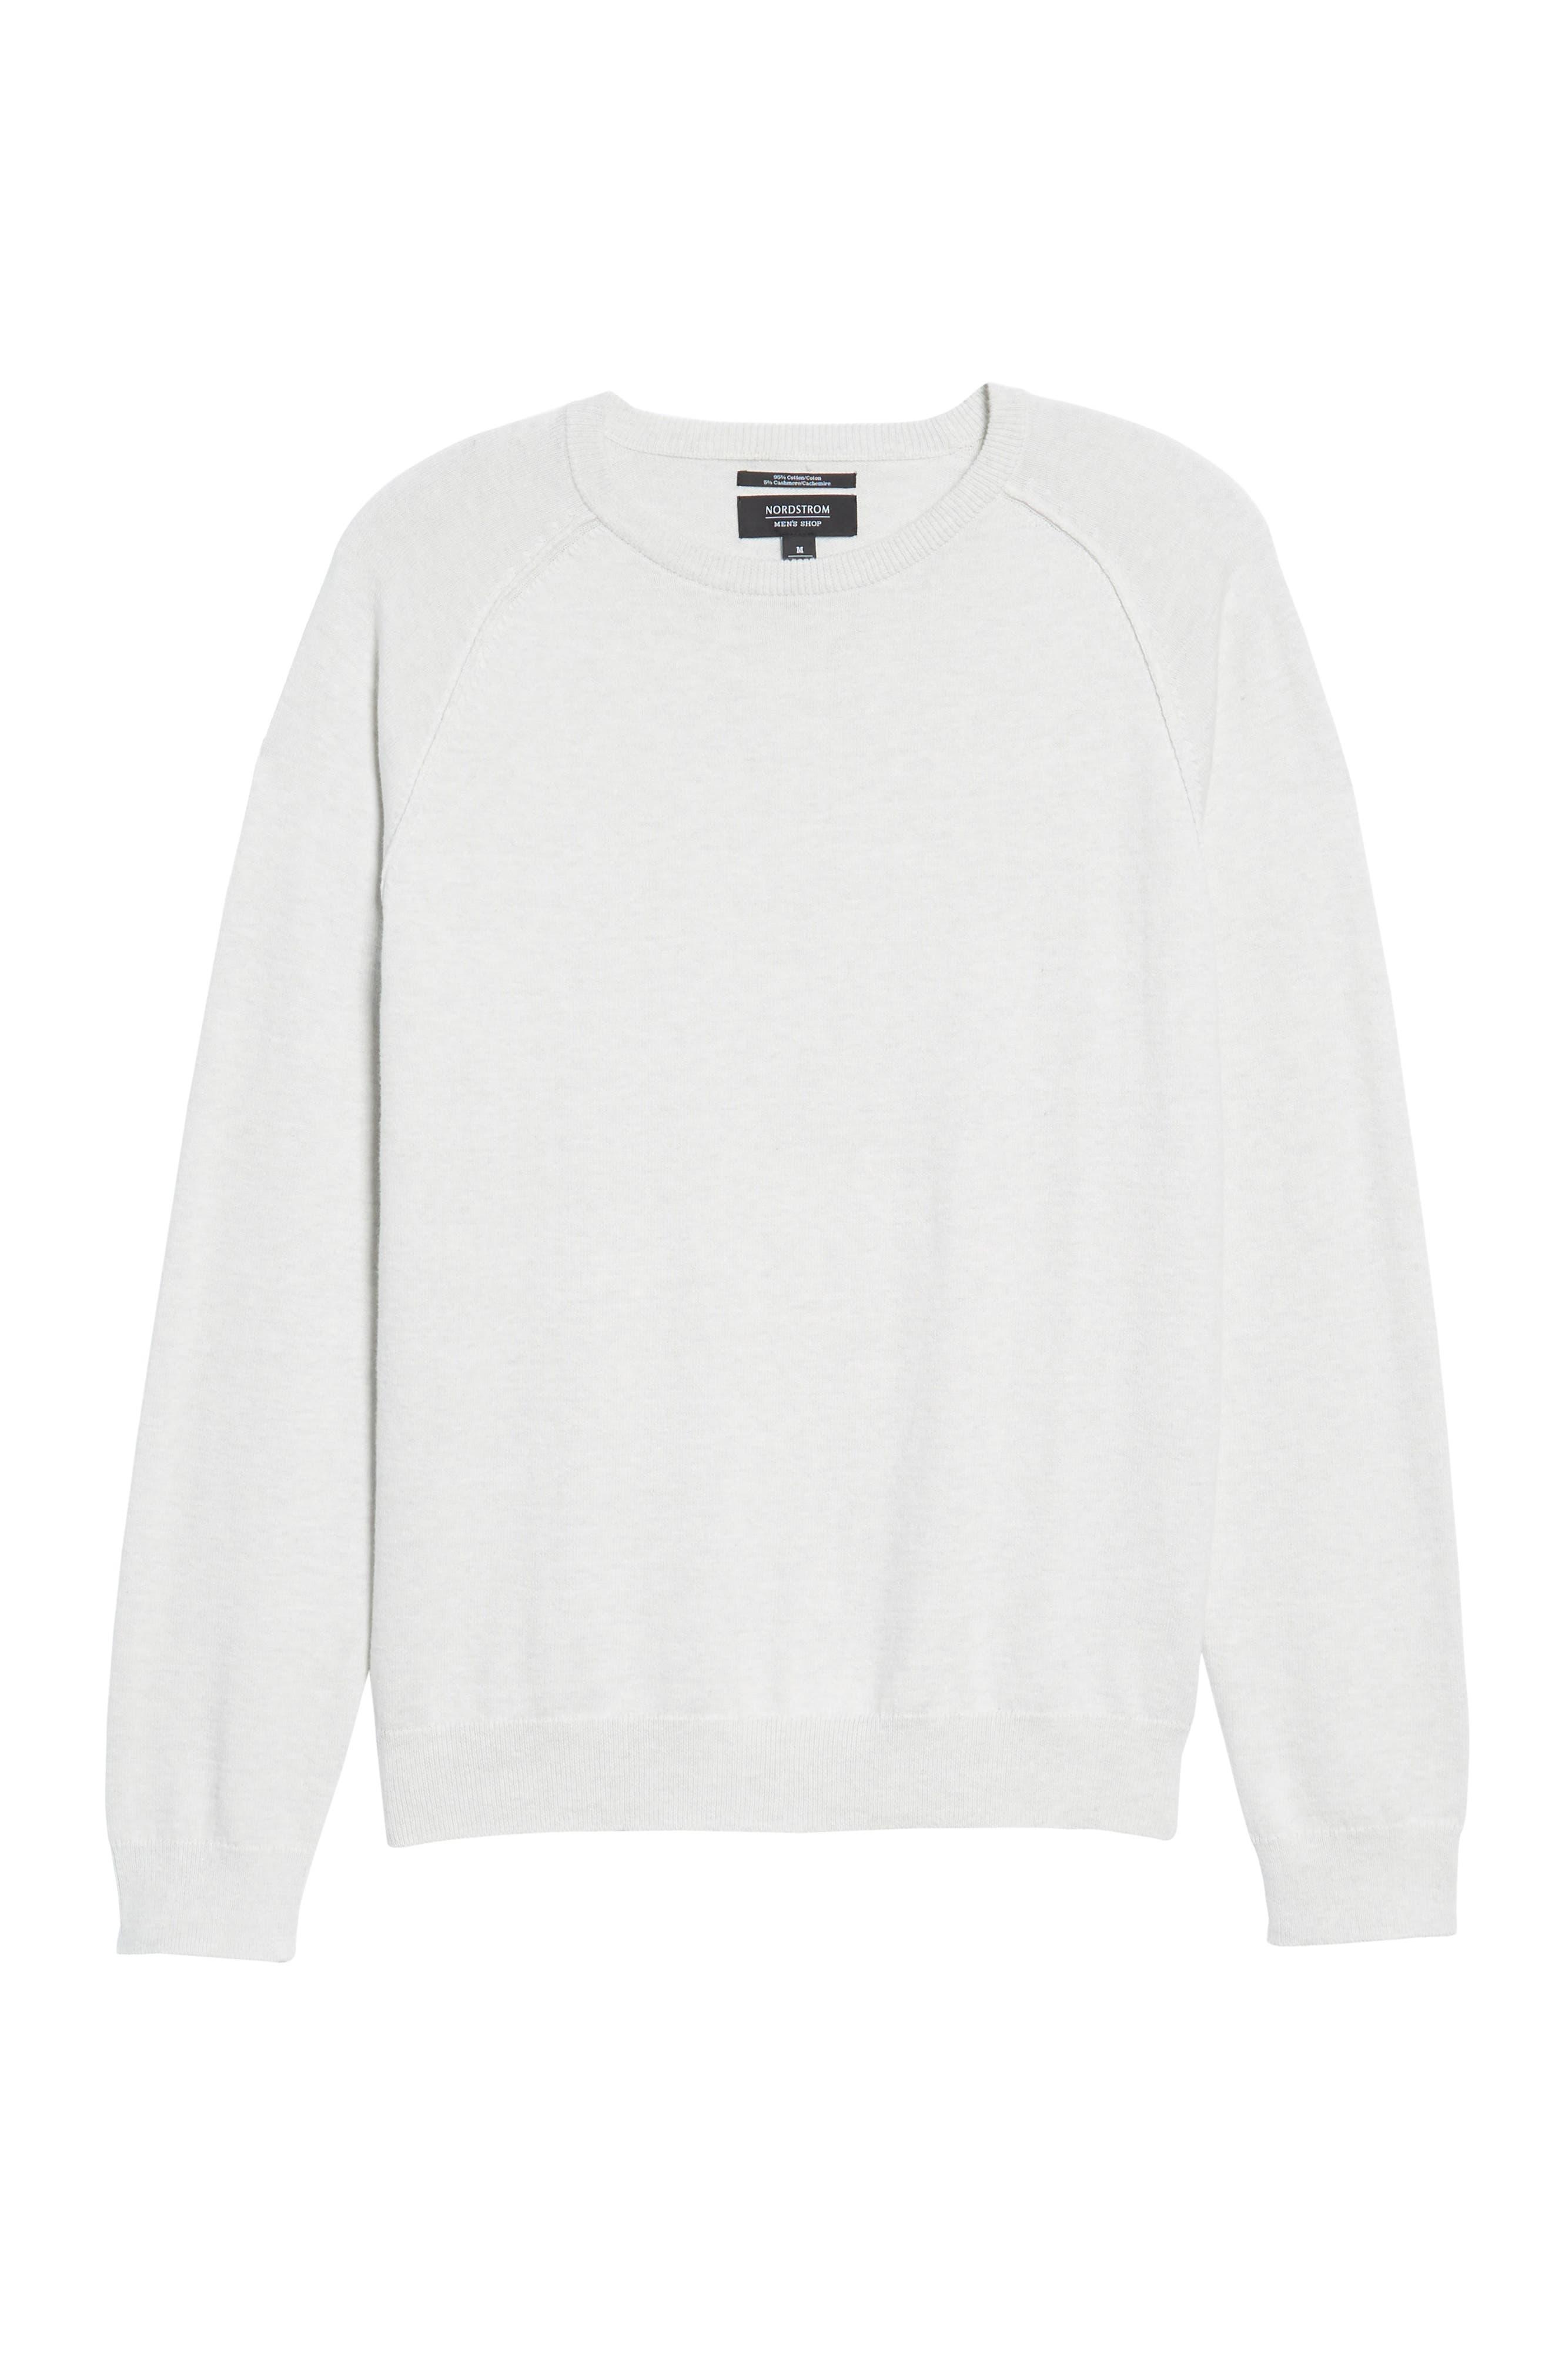 Saddle Shoulder Cotton & Cashmere Sweater,                             Alternate thumbnail 6, color,                             White Marl